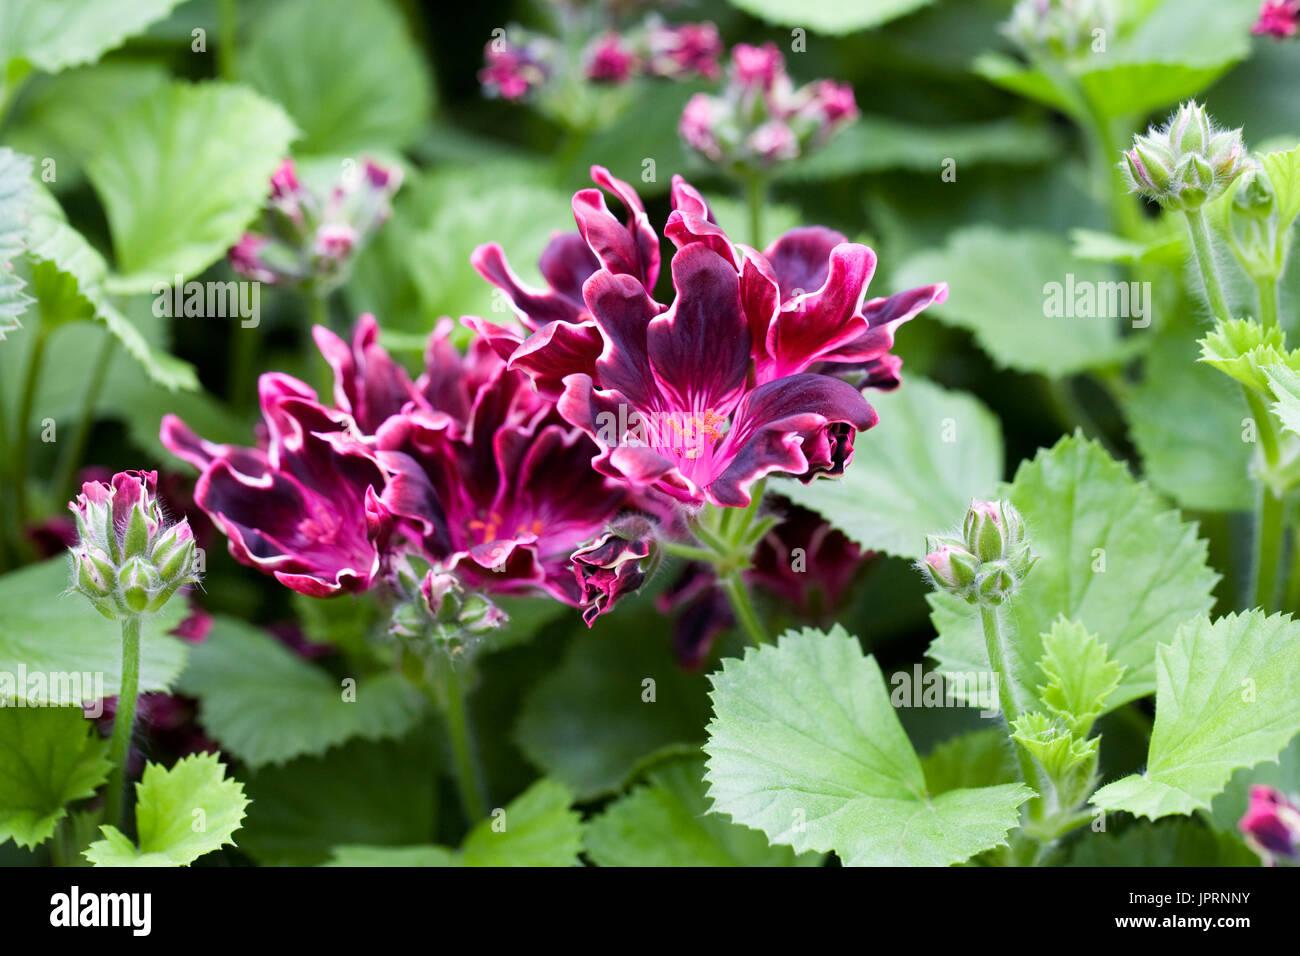 Pelargonium 'Lord Bute' Blumen. Stockbild